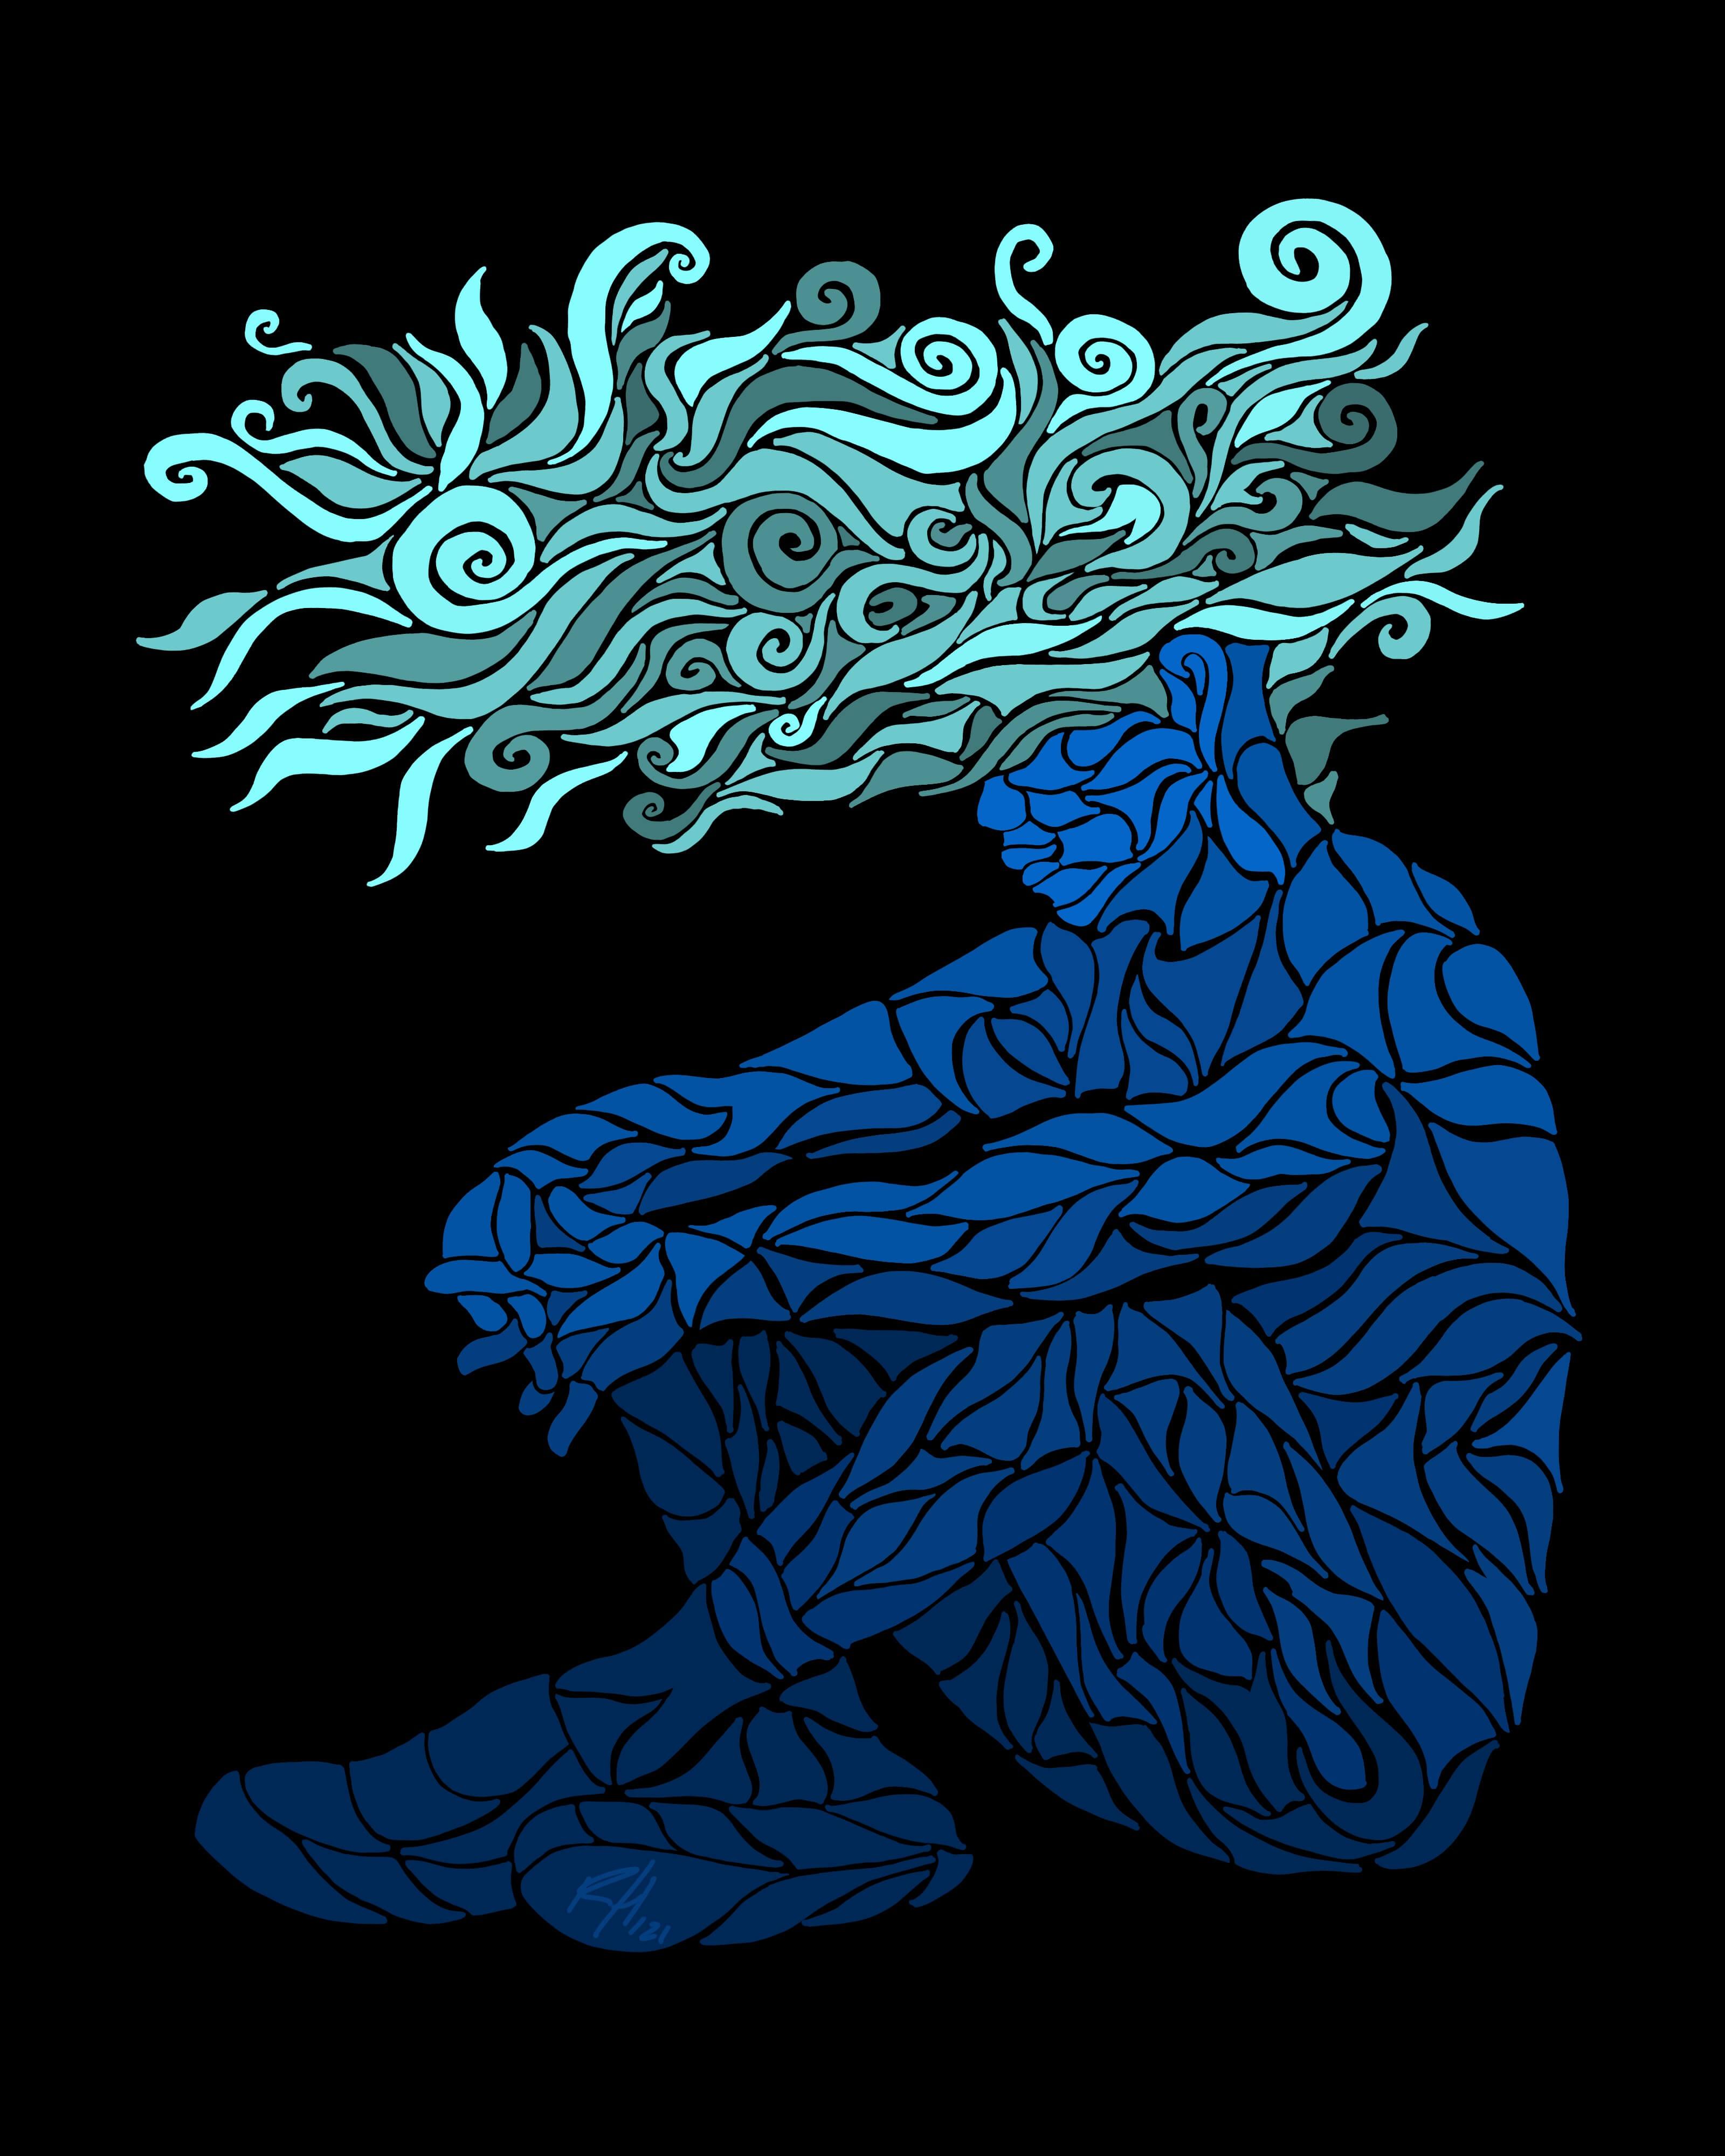 abstract drawing of a man thinking